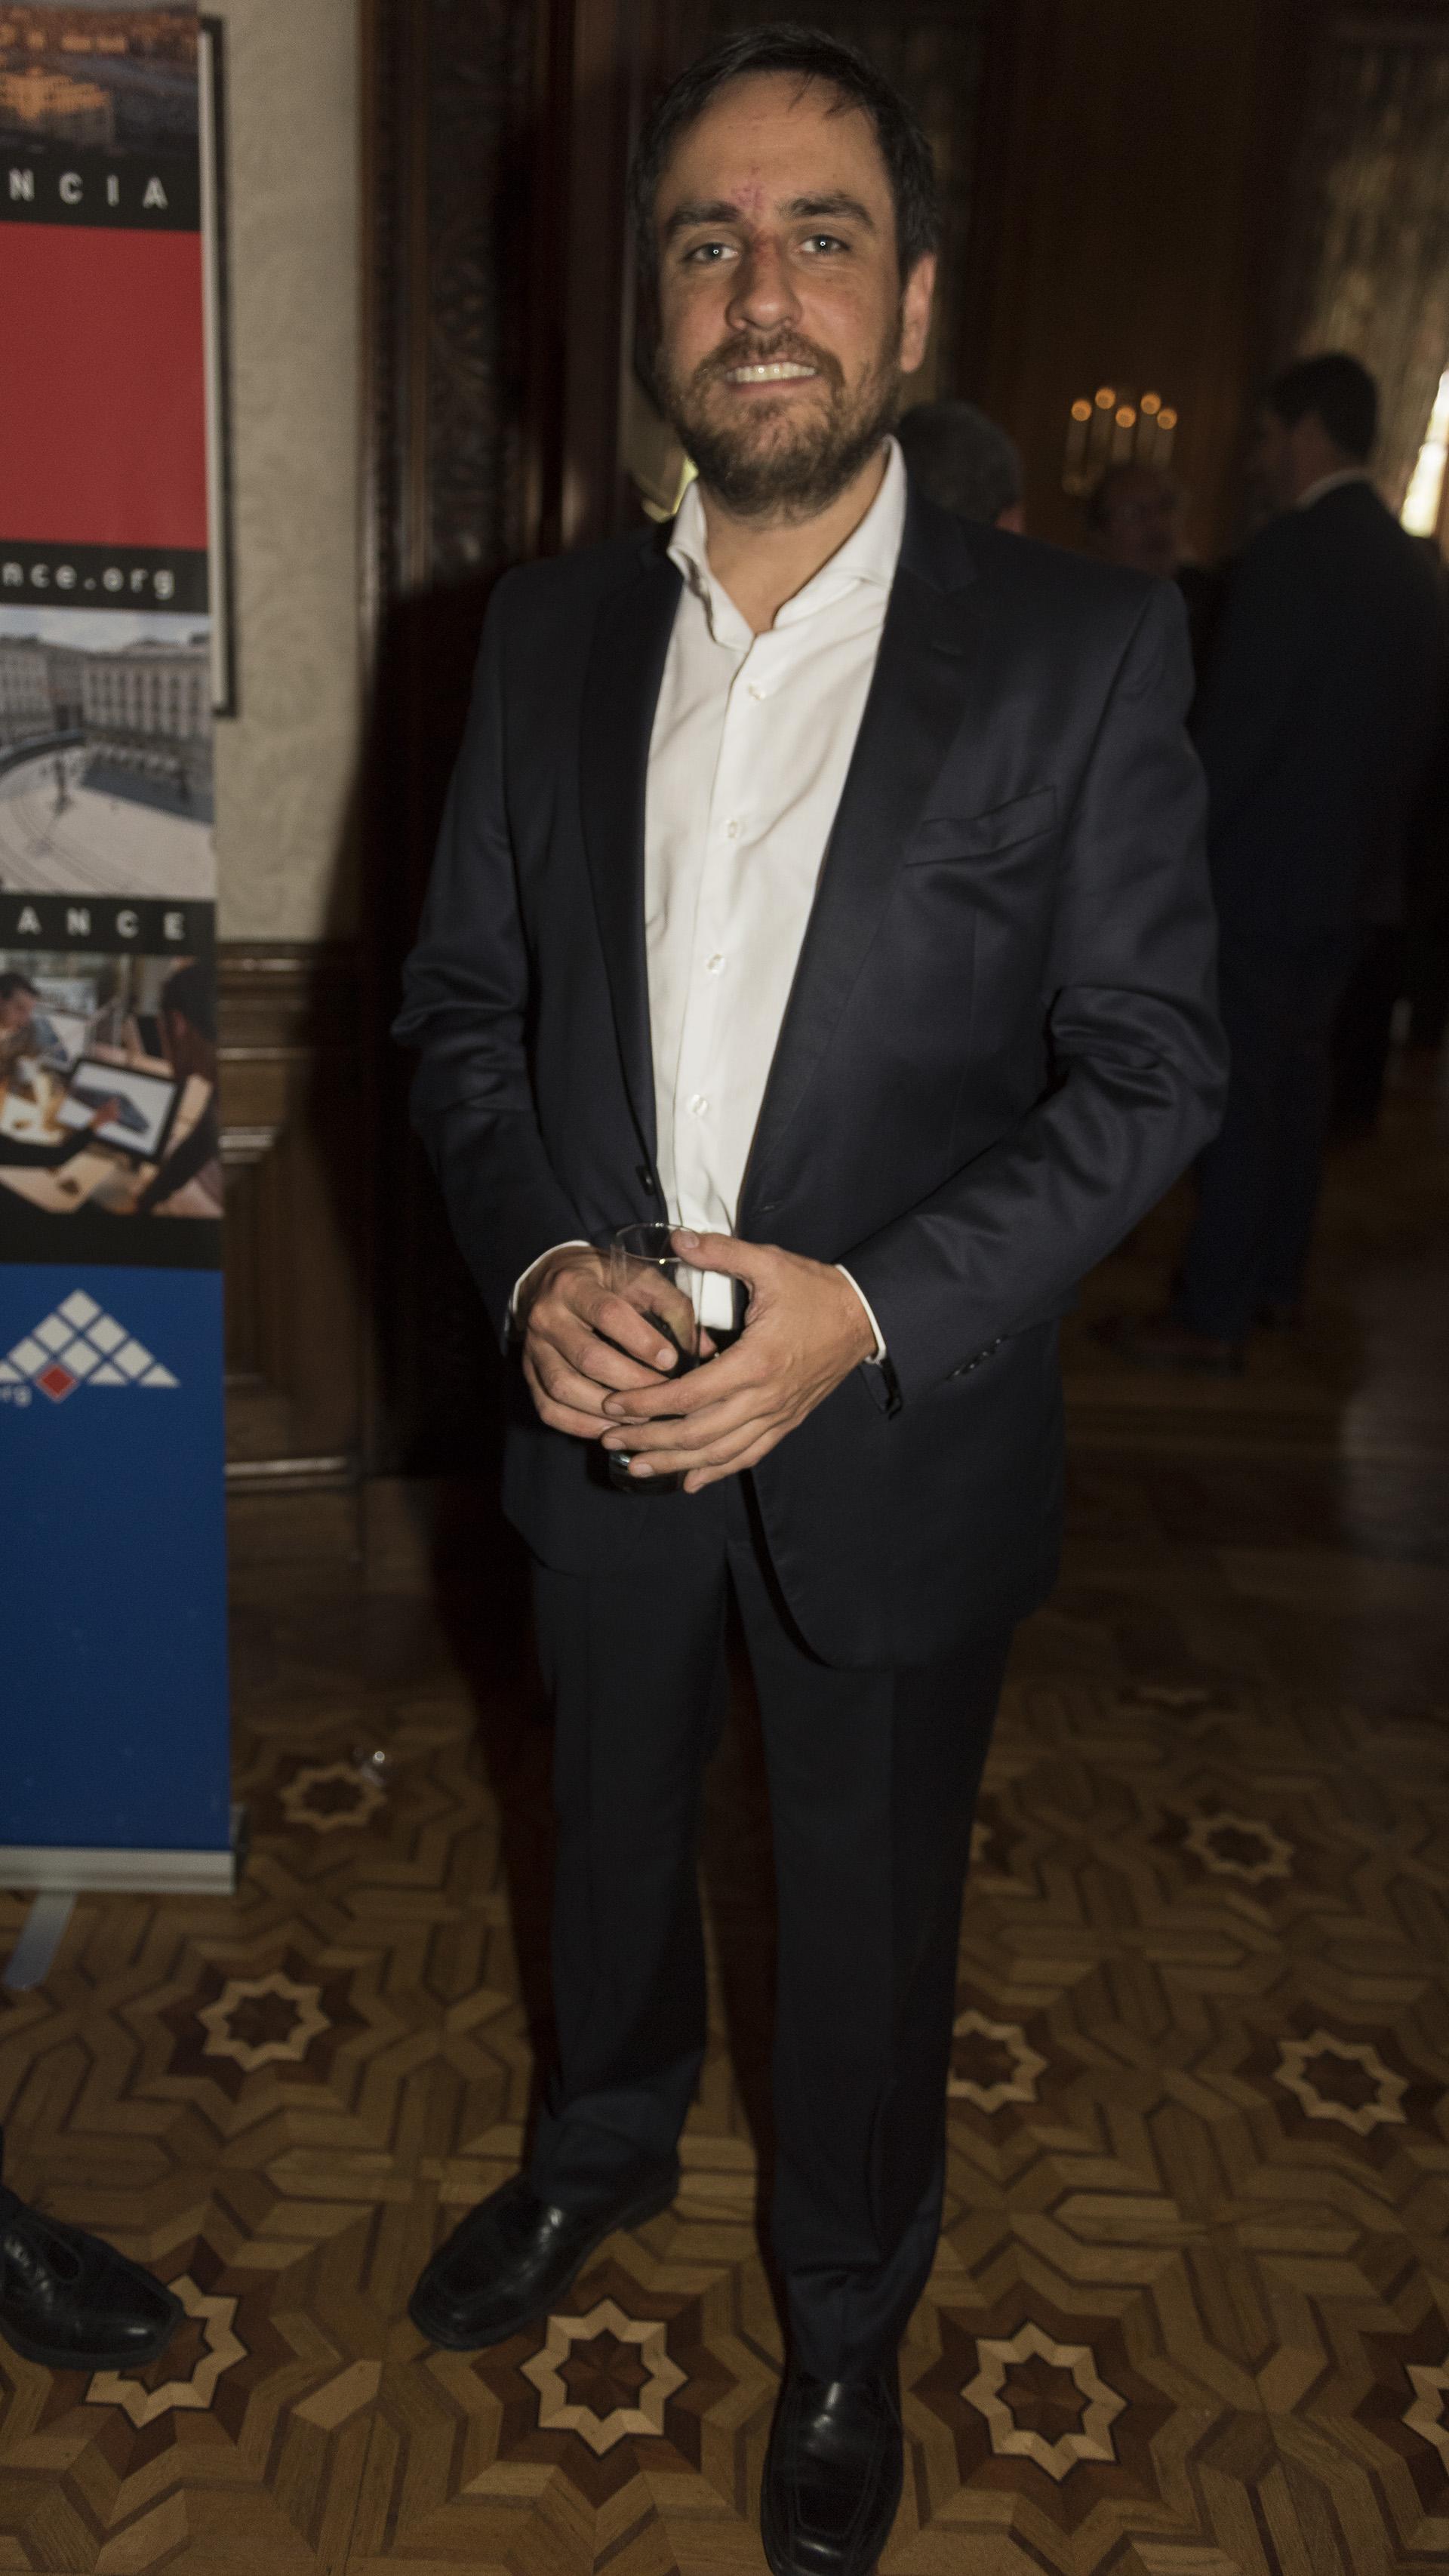 El diputado Juan Cabandié